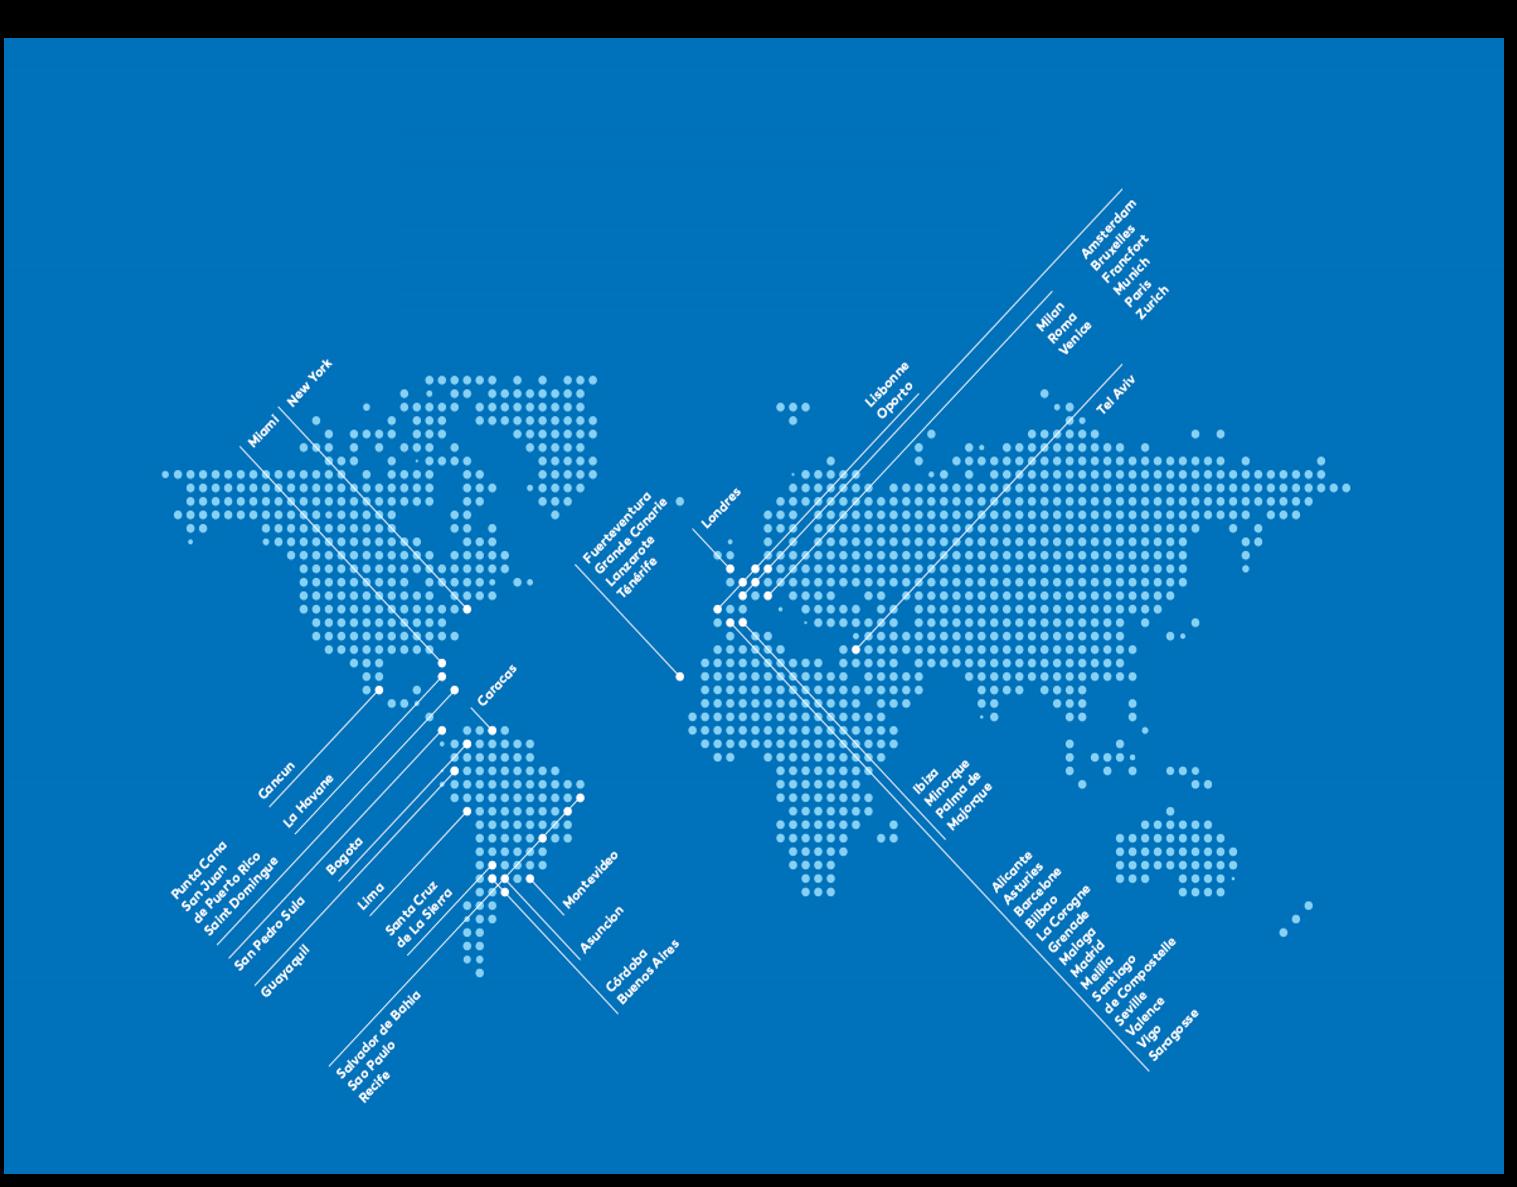 Carte du réseau Air Europa